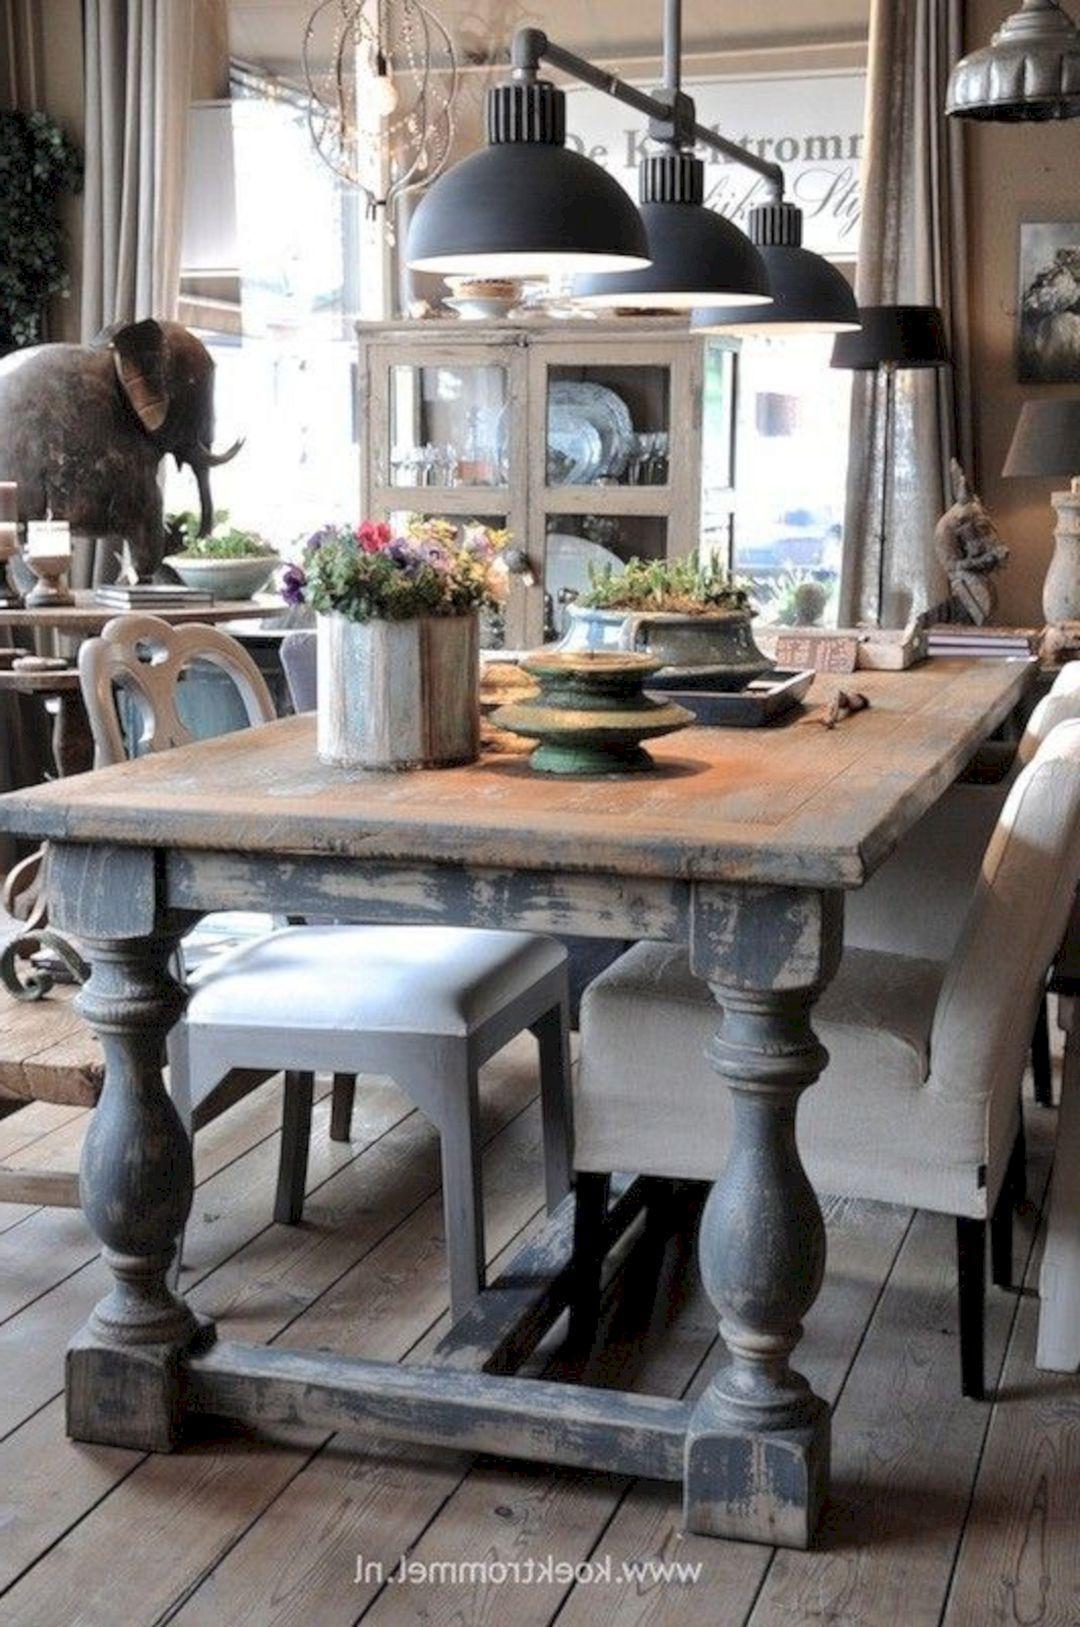 75 Simple And Minimalist Dining Table Decor Ideas 25041